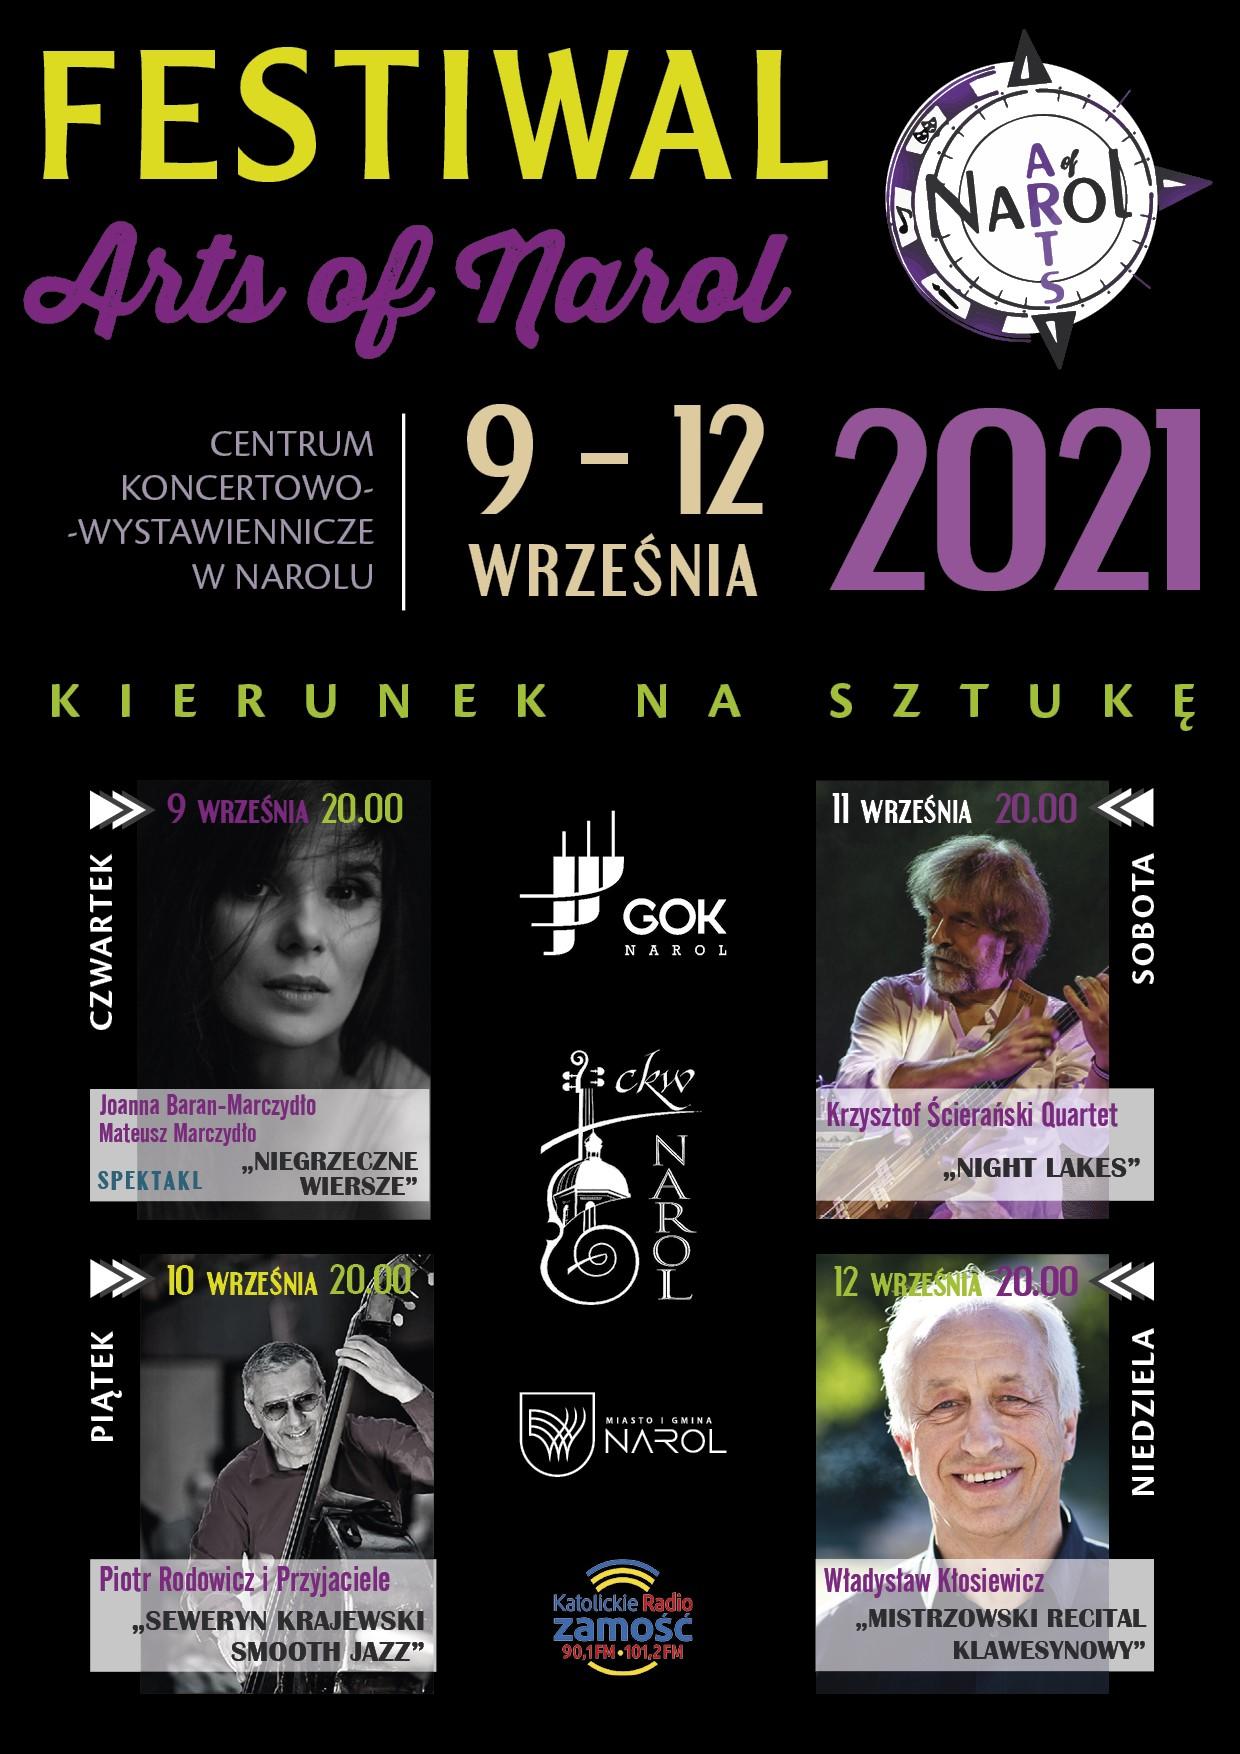 Festiwal Arts of Narol 2021